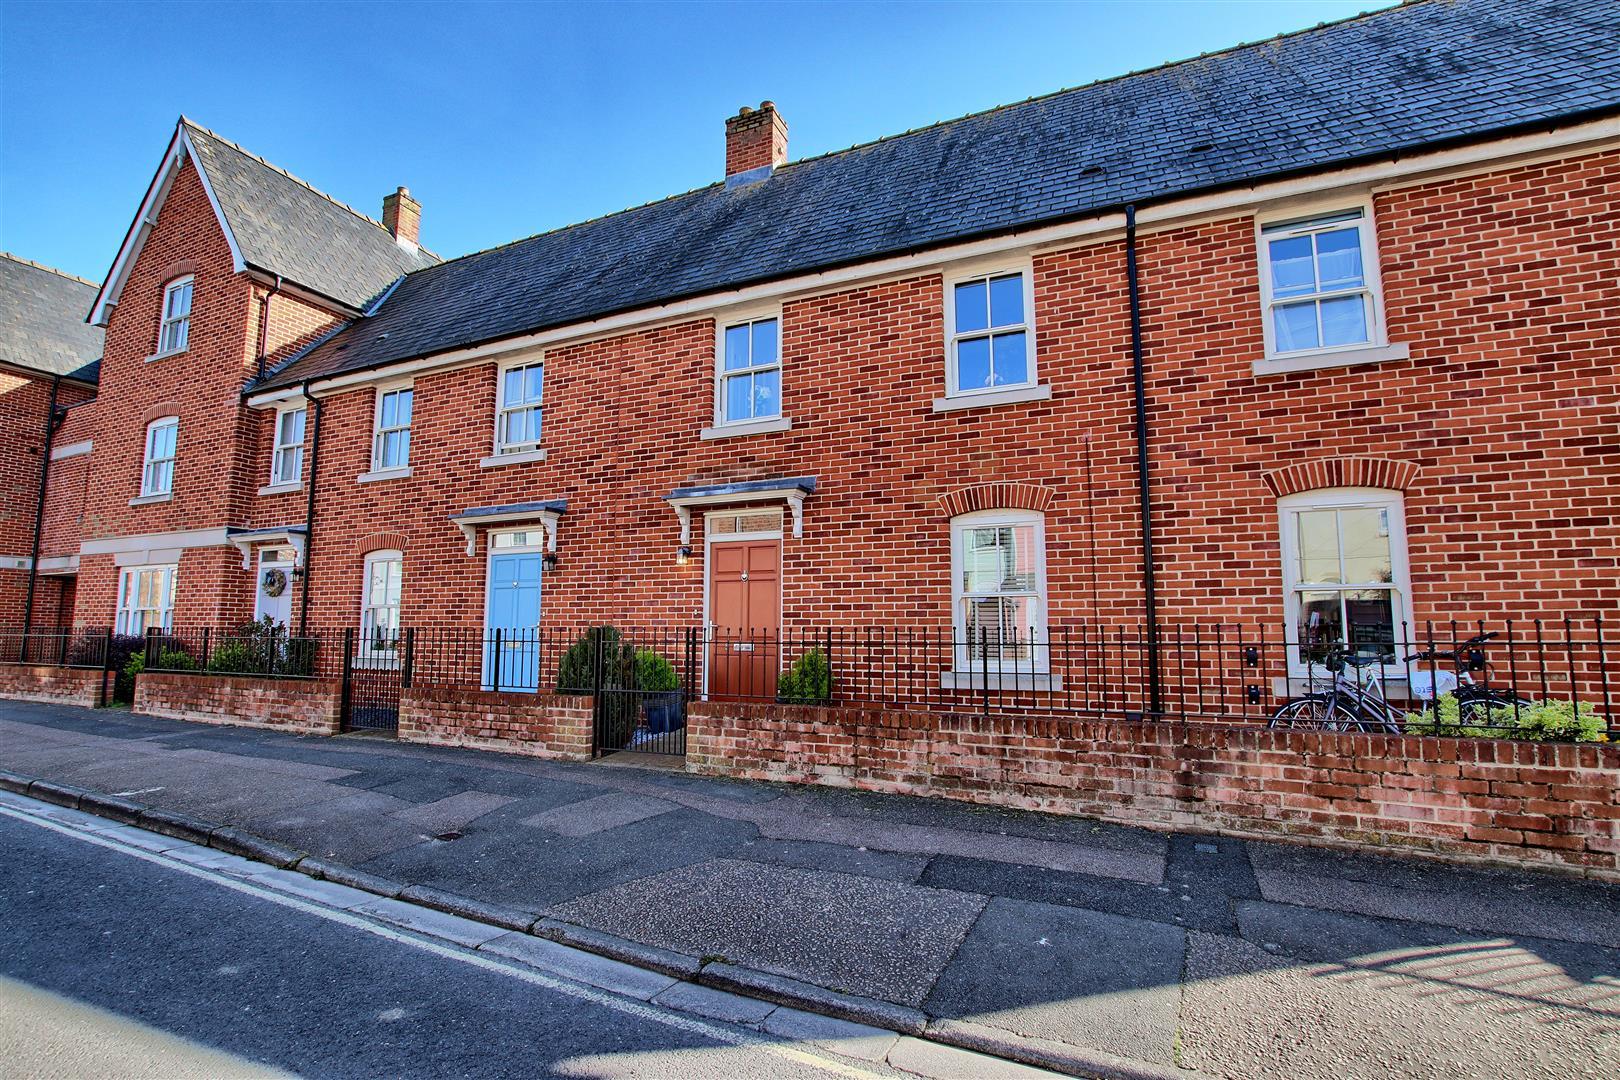 Bunbury Terrace, All Saints Road, Newmarket